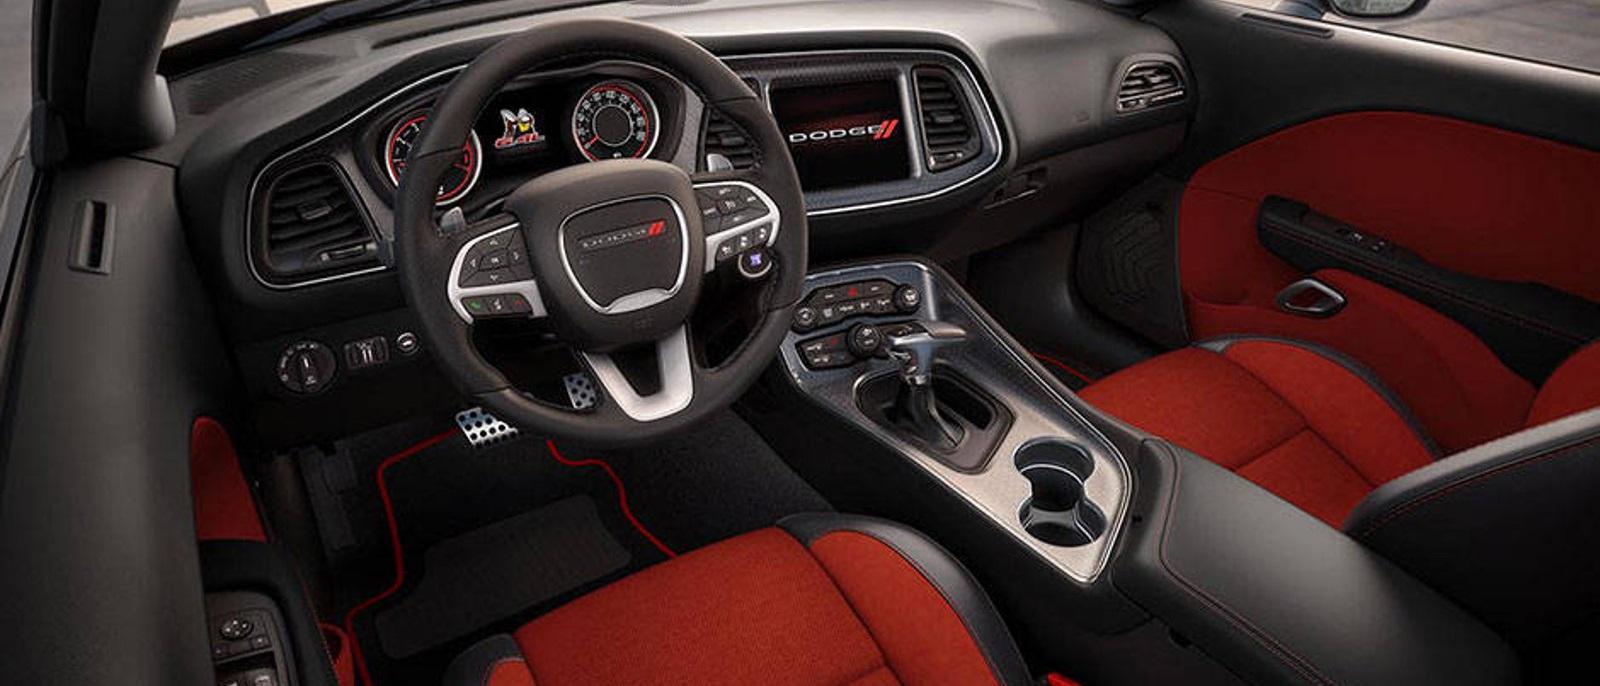 2015 Challenger Interior 2015 Dodge Challenger Srt